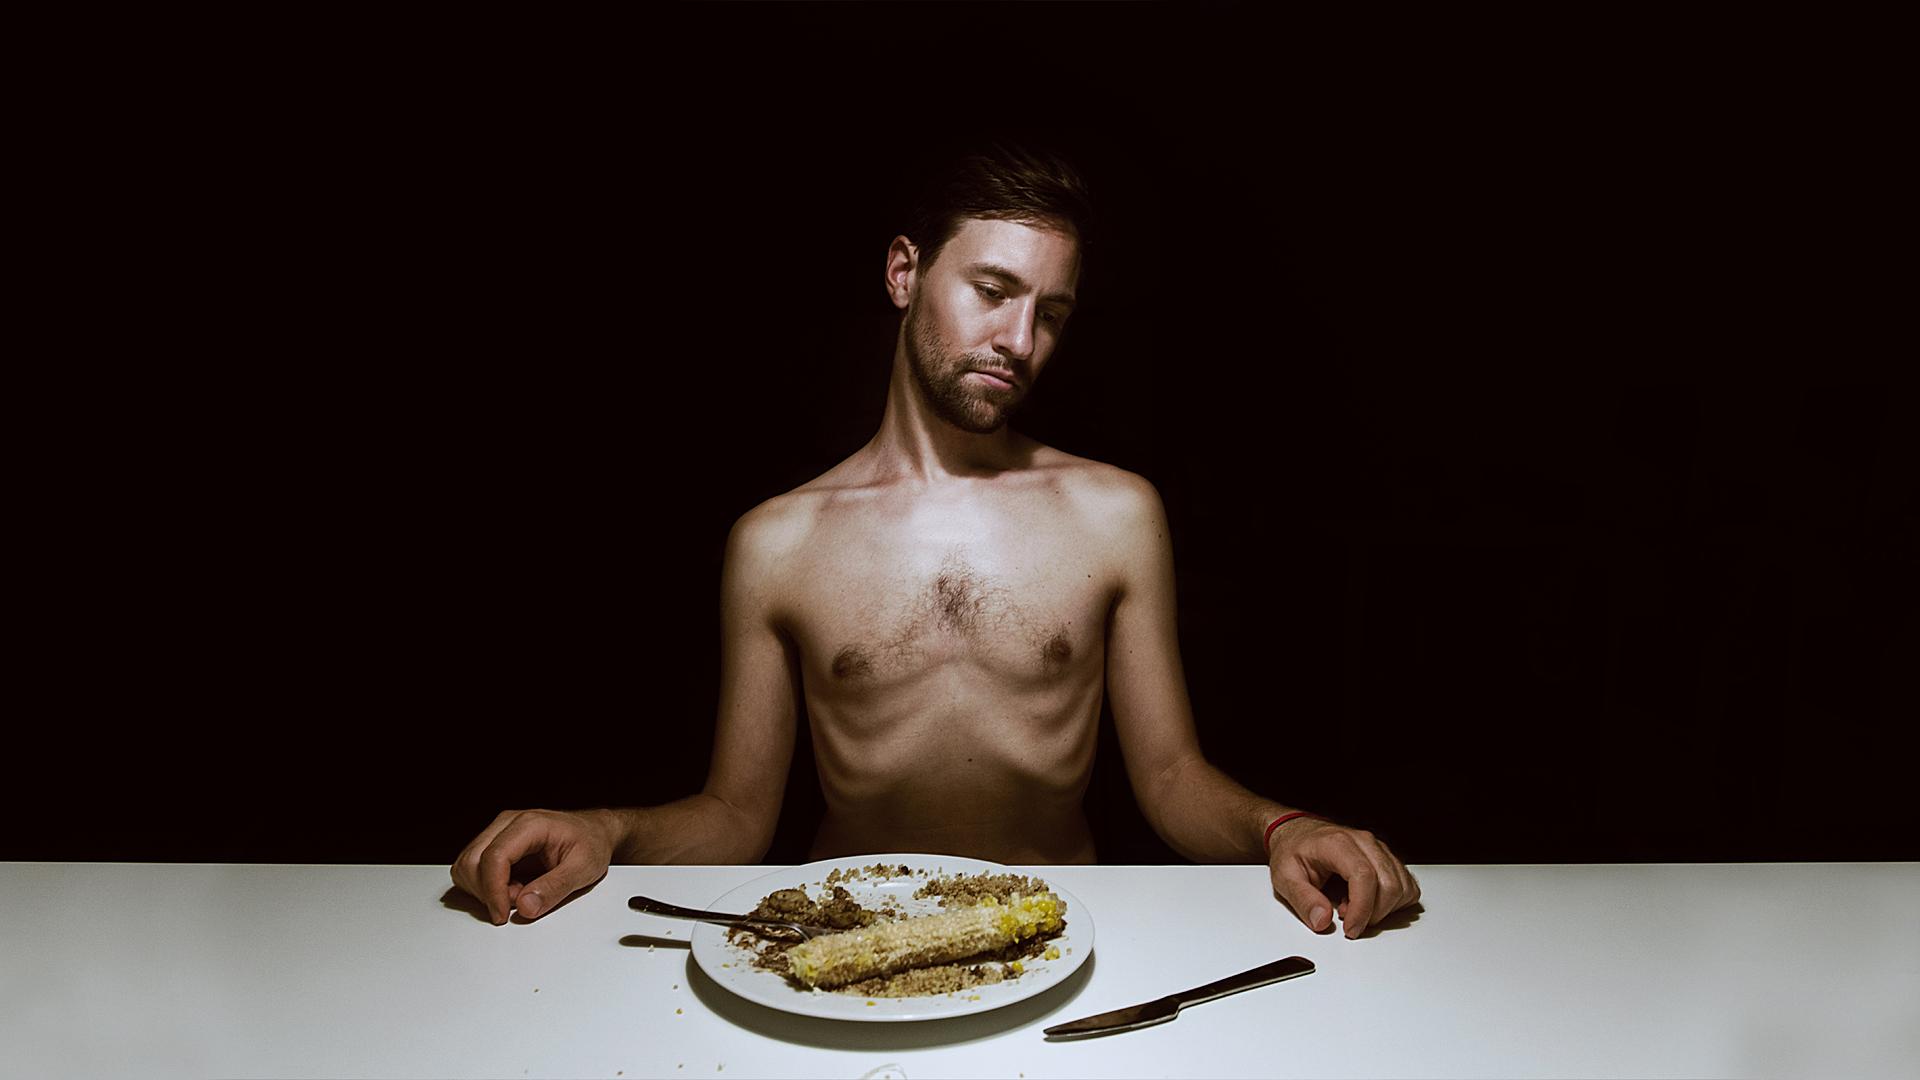 starve-skinny-model-food-health.jpg